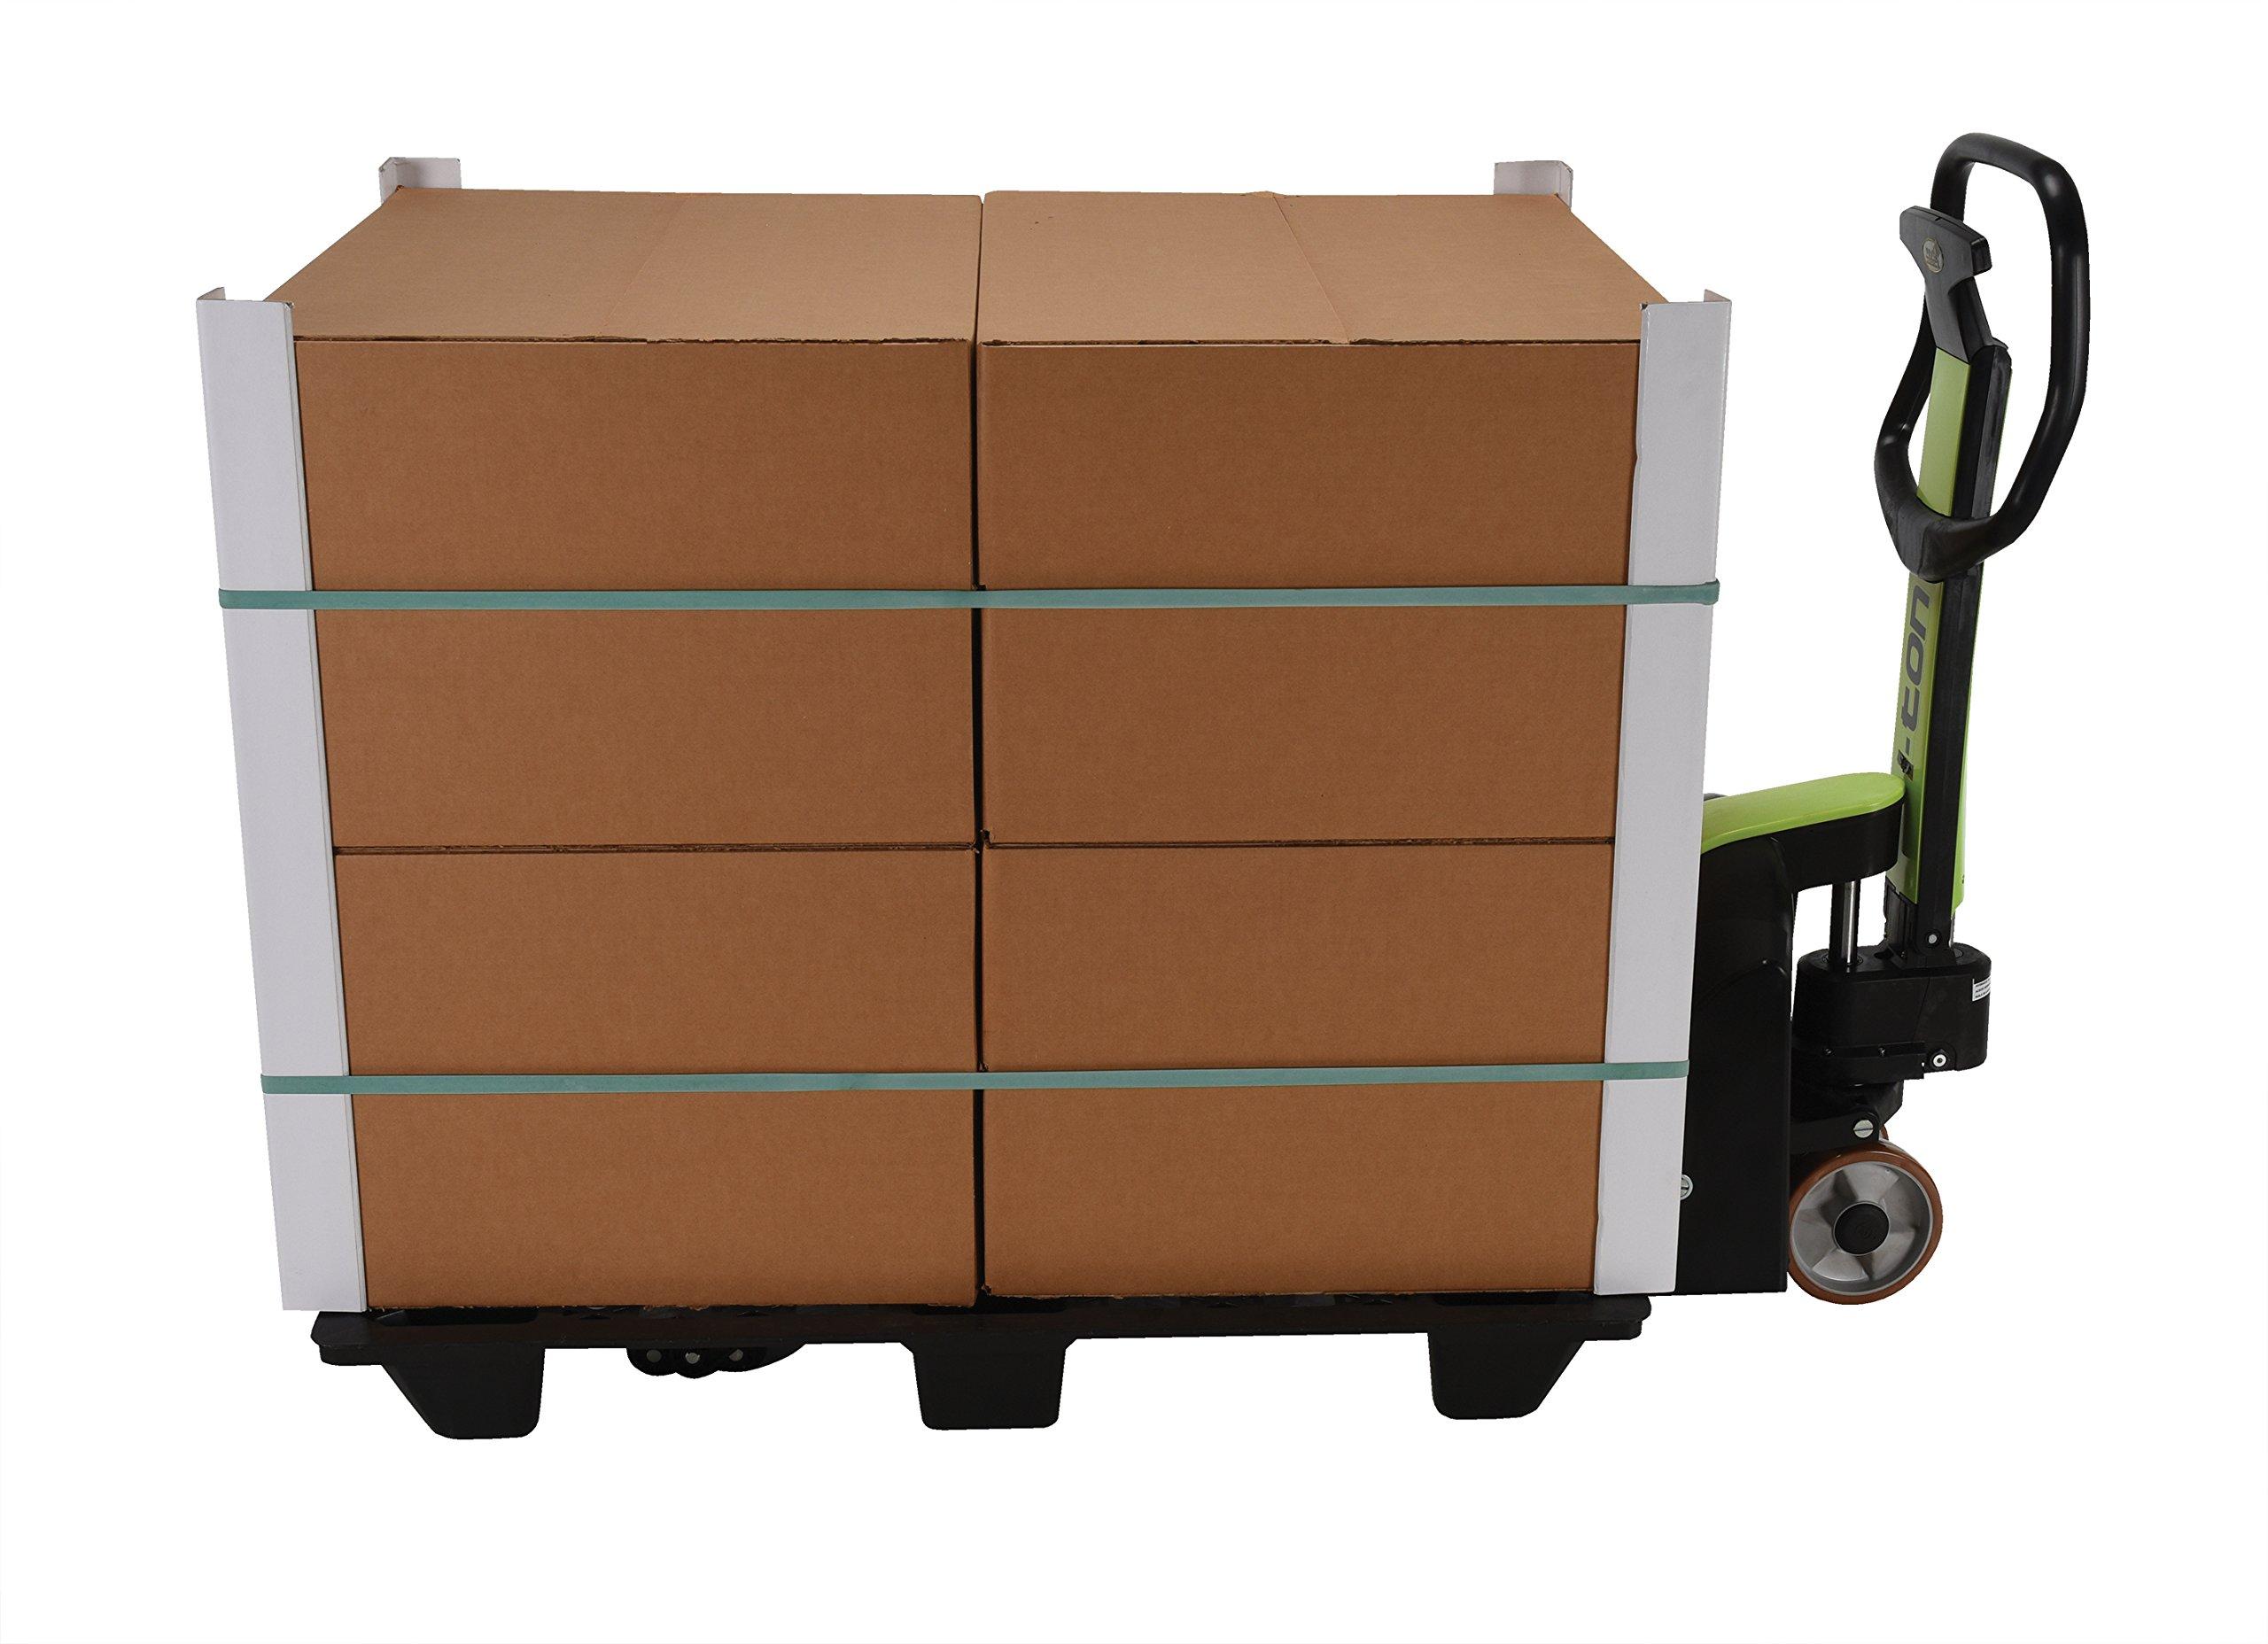 Vestil PMC-PPM-2045-G Plastic Pramac I-Ton Pallet Truck Galv Pump, Painted Green/Black, 2200 lb. Capacity by Vestil (Image #5)